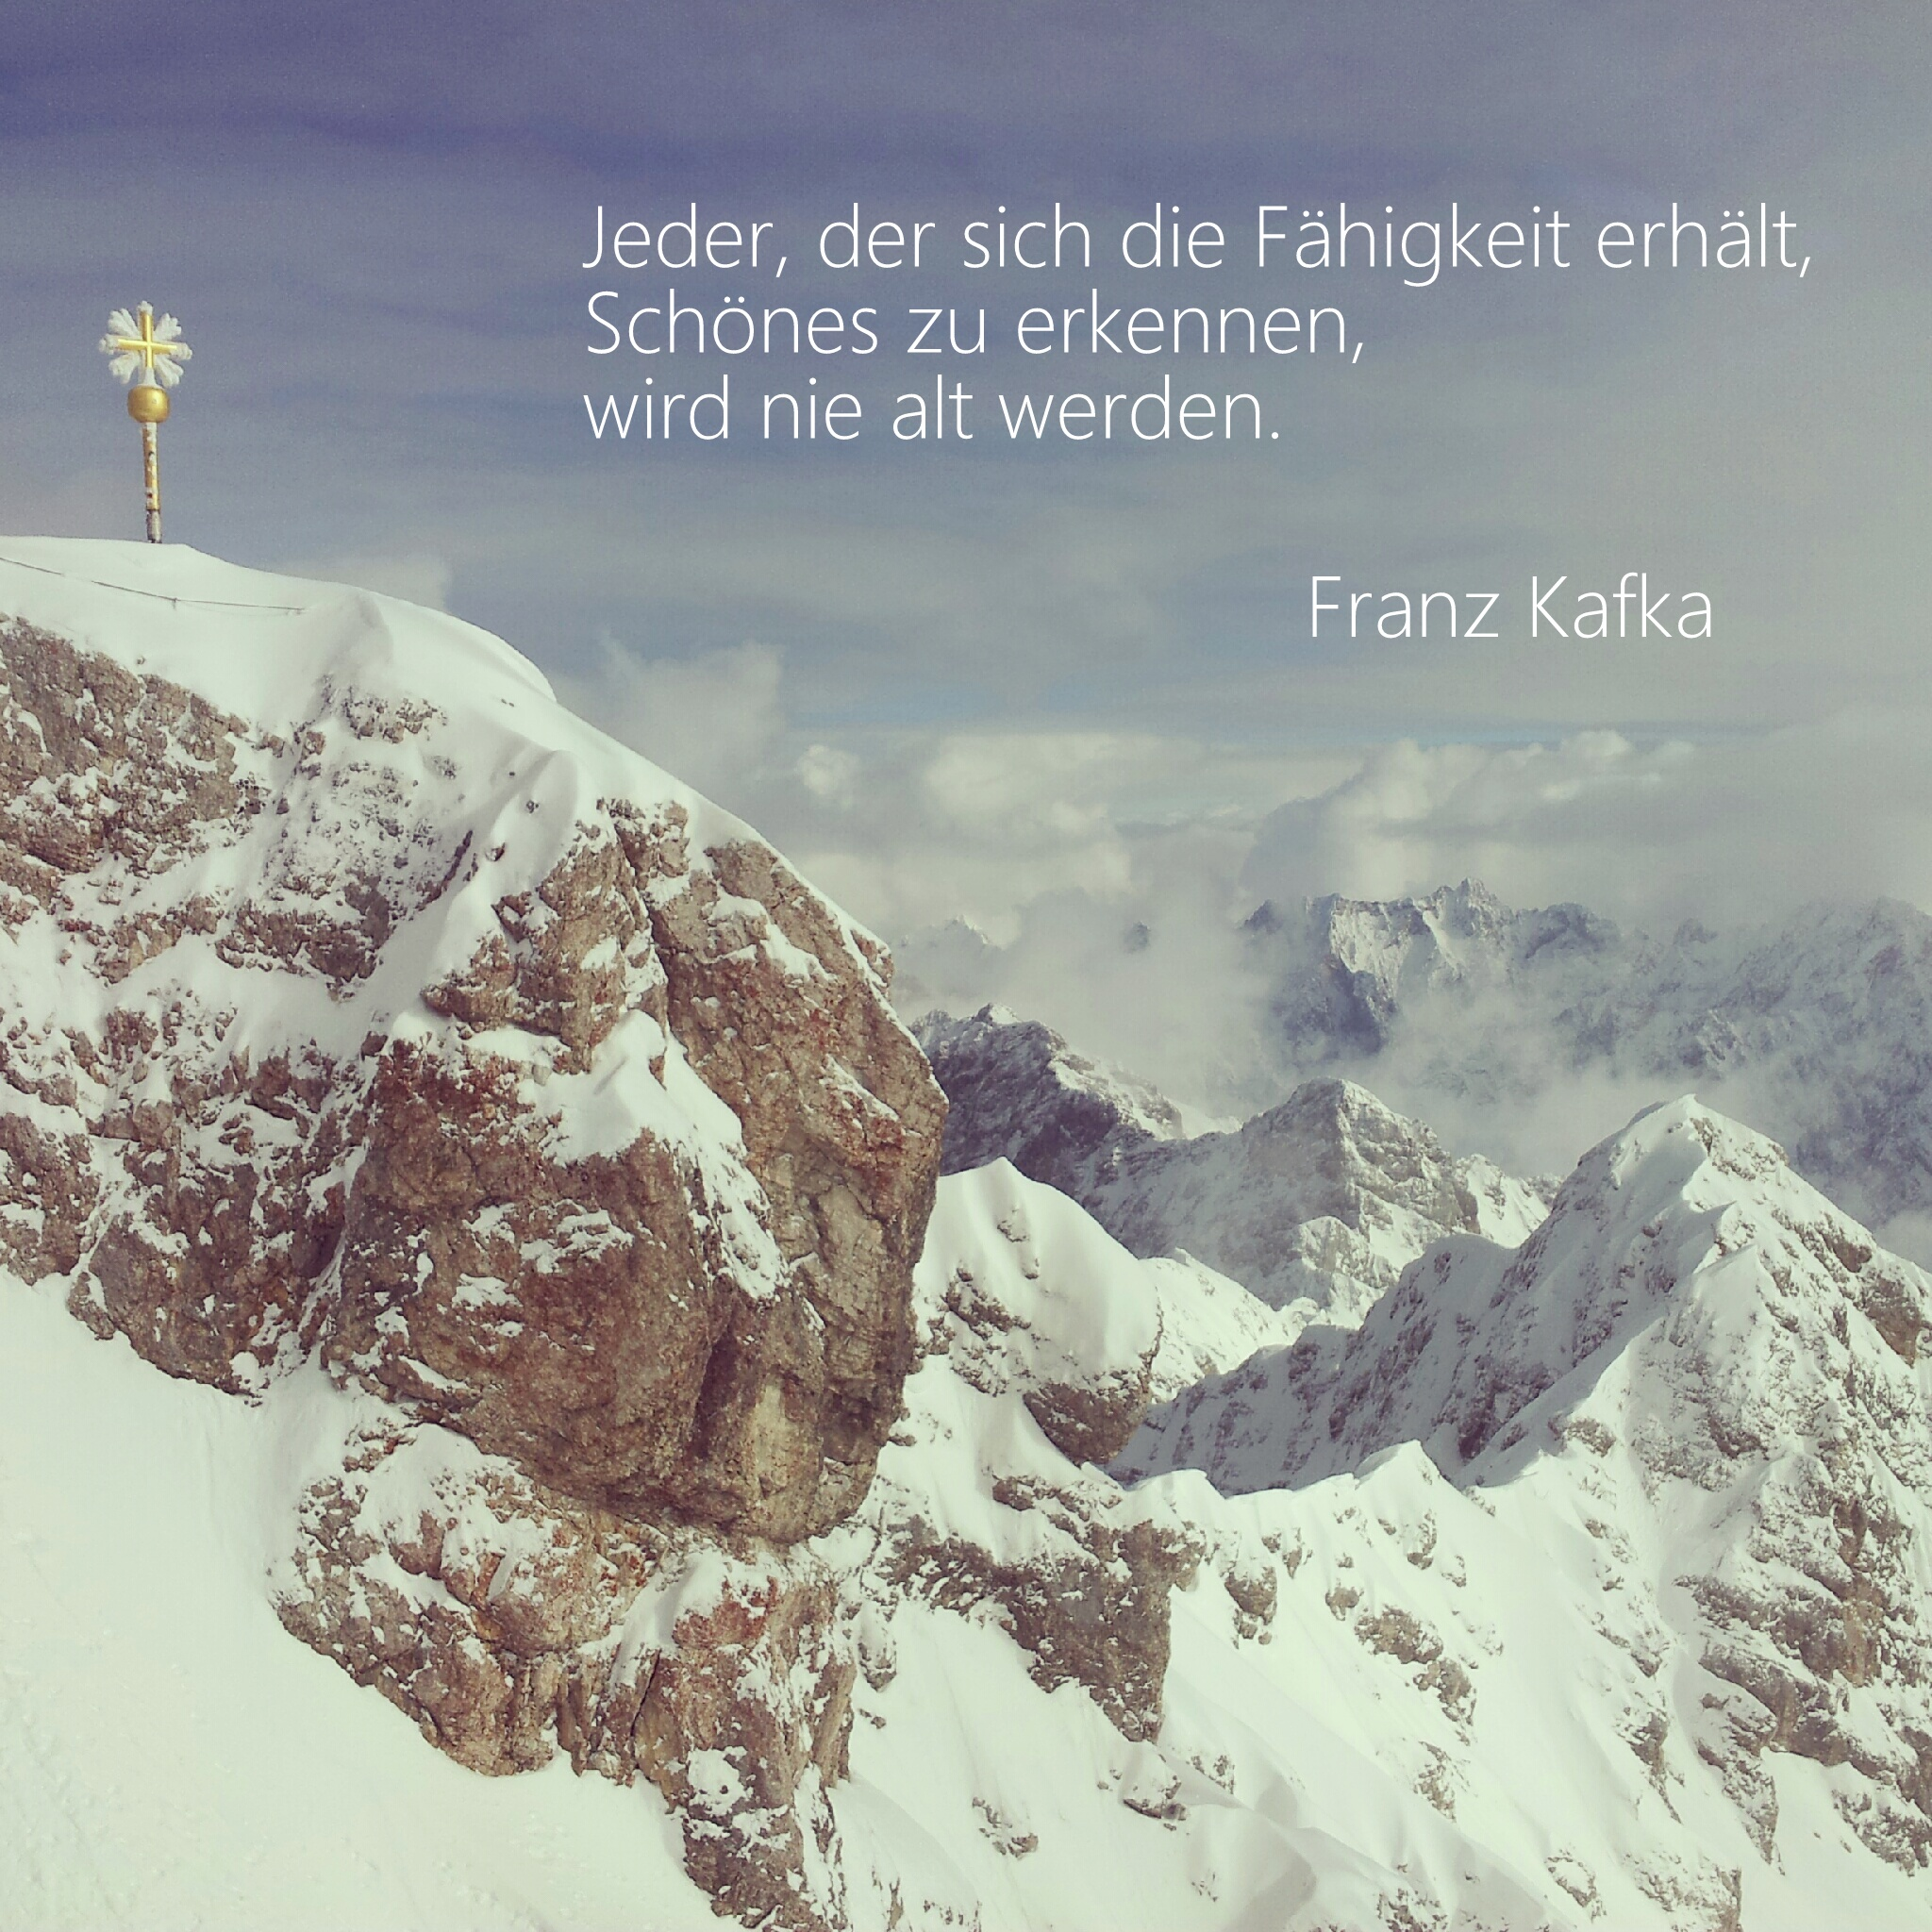 Zitat Leben Kafka Sprüche Zitate Leben